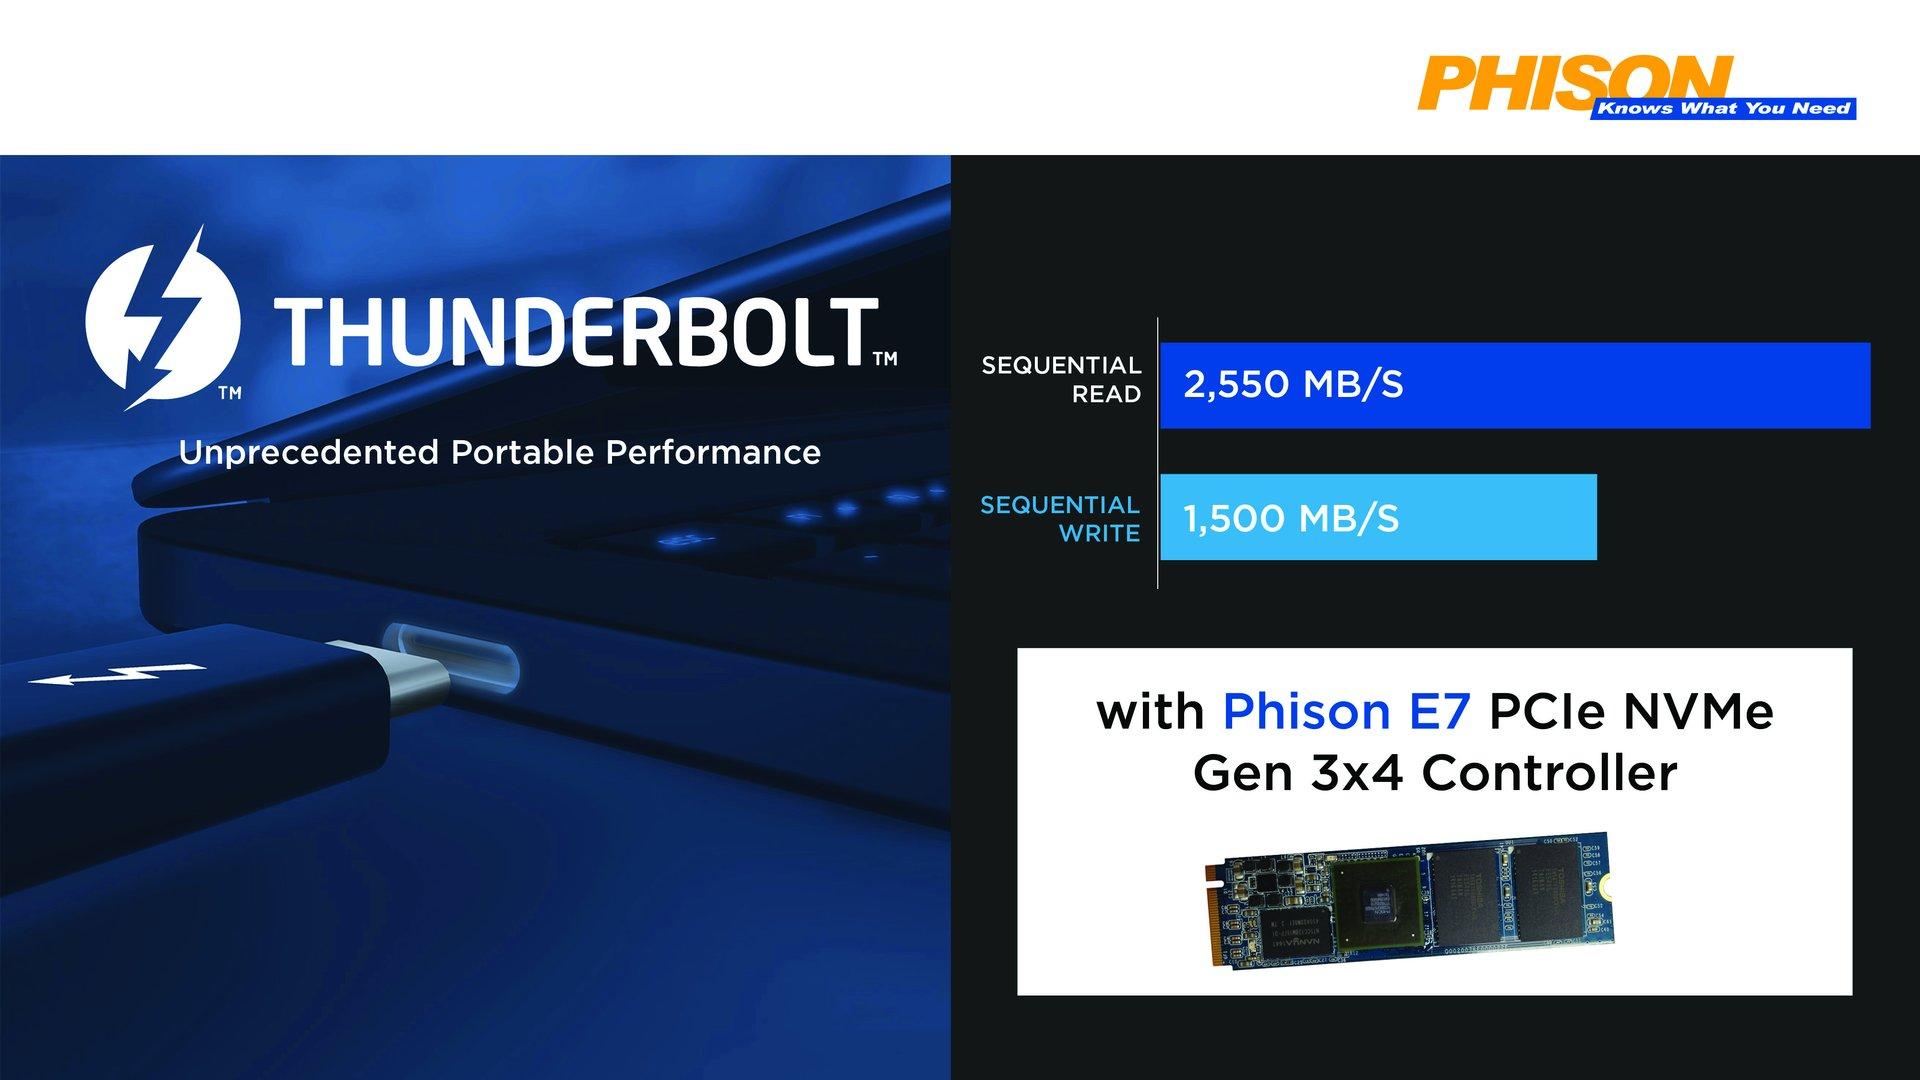 Thunderbolt3-SSD mit Phison E7